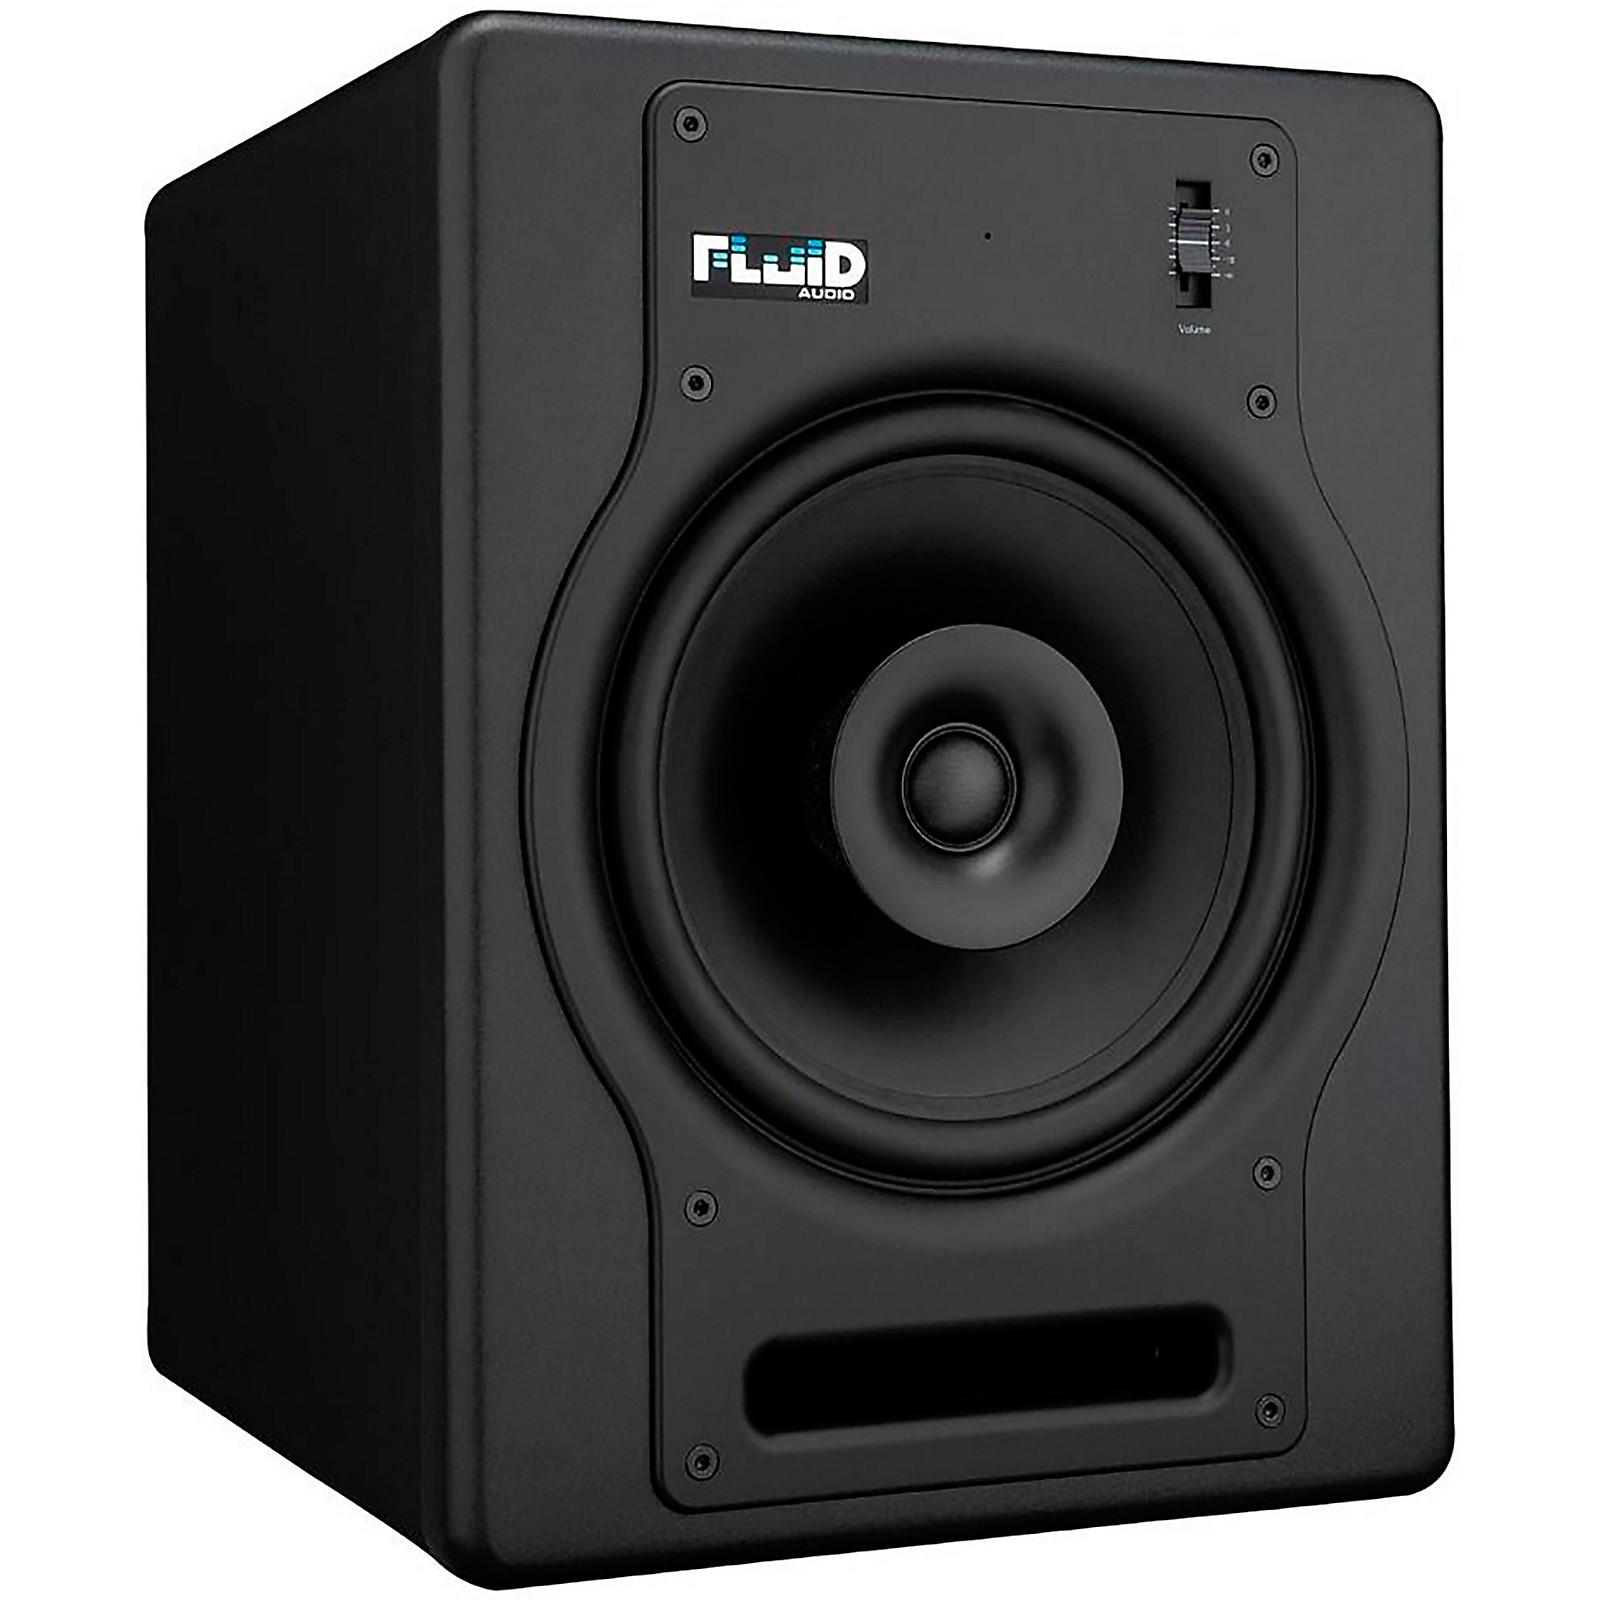 Fluid Audio FAFX8 Coaxial Studio Monitor